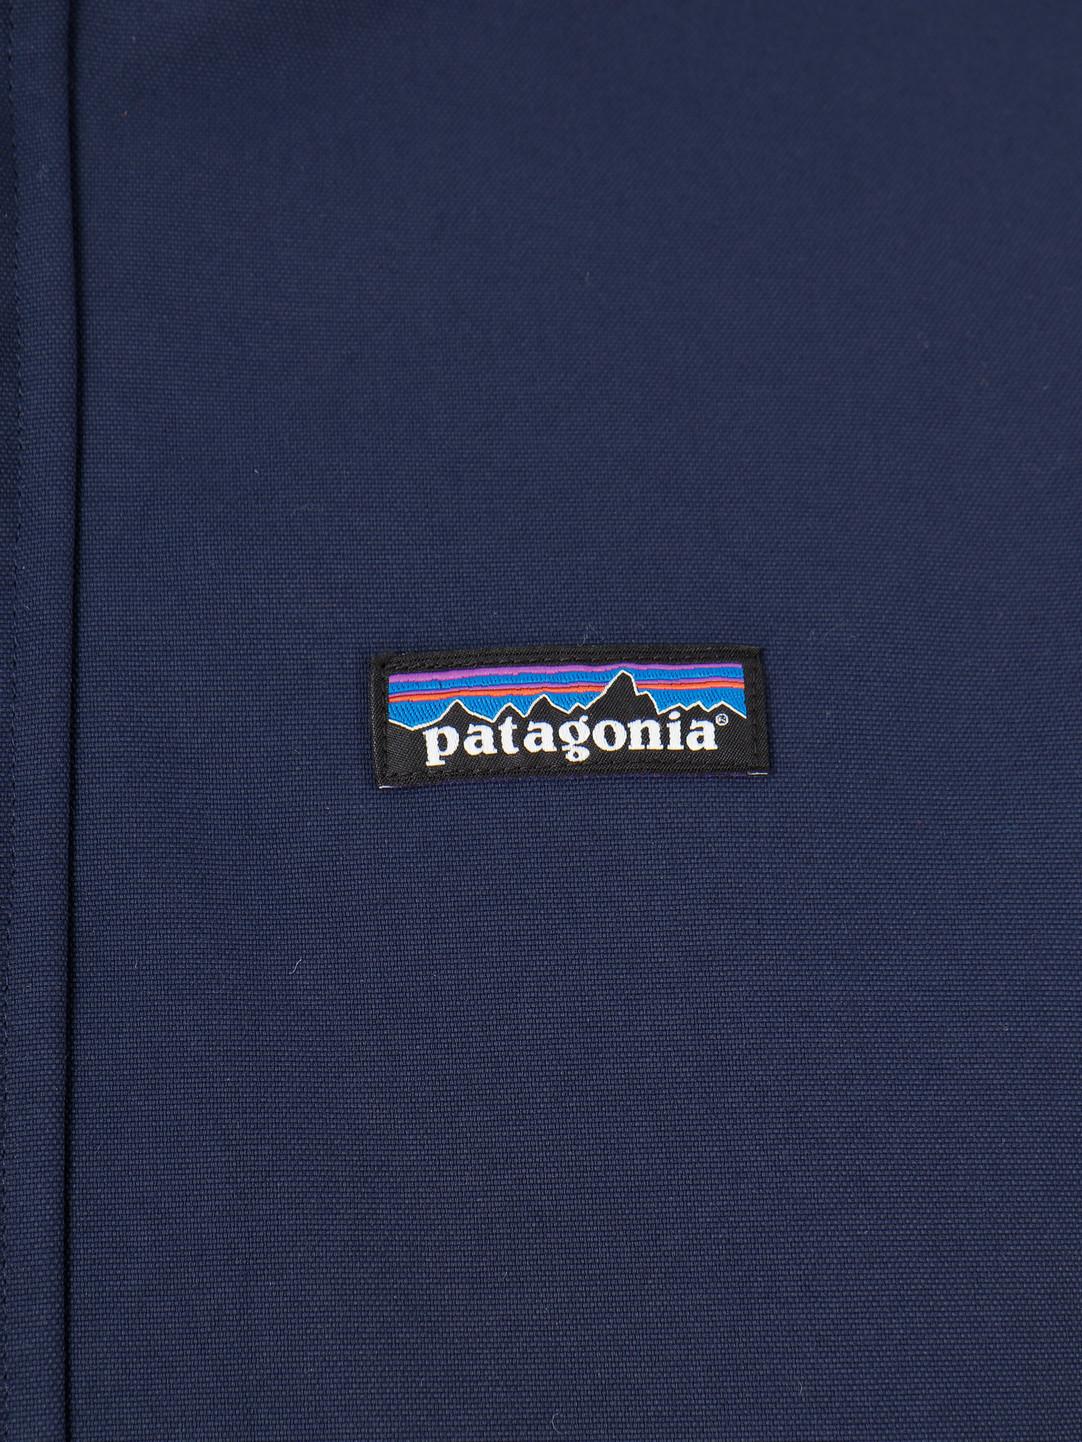 Patagonia Patagonia Lone Mountain Parka New Navy 27865